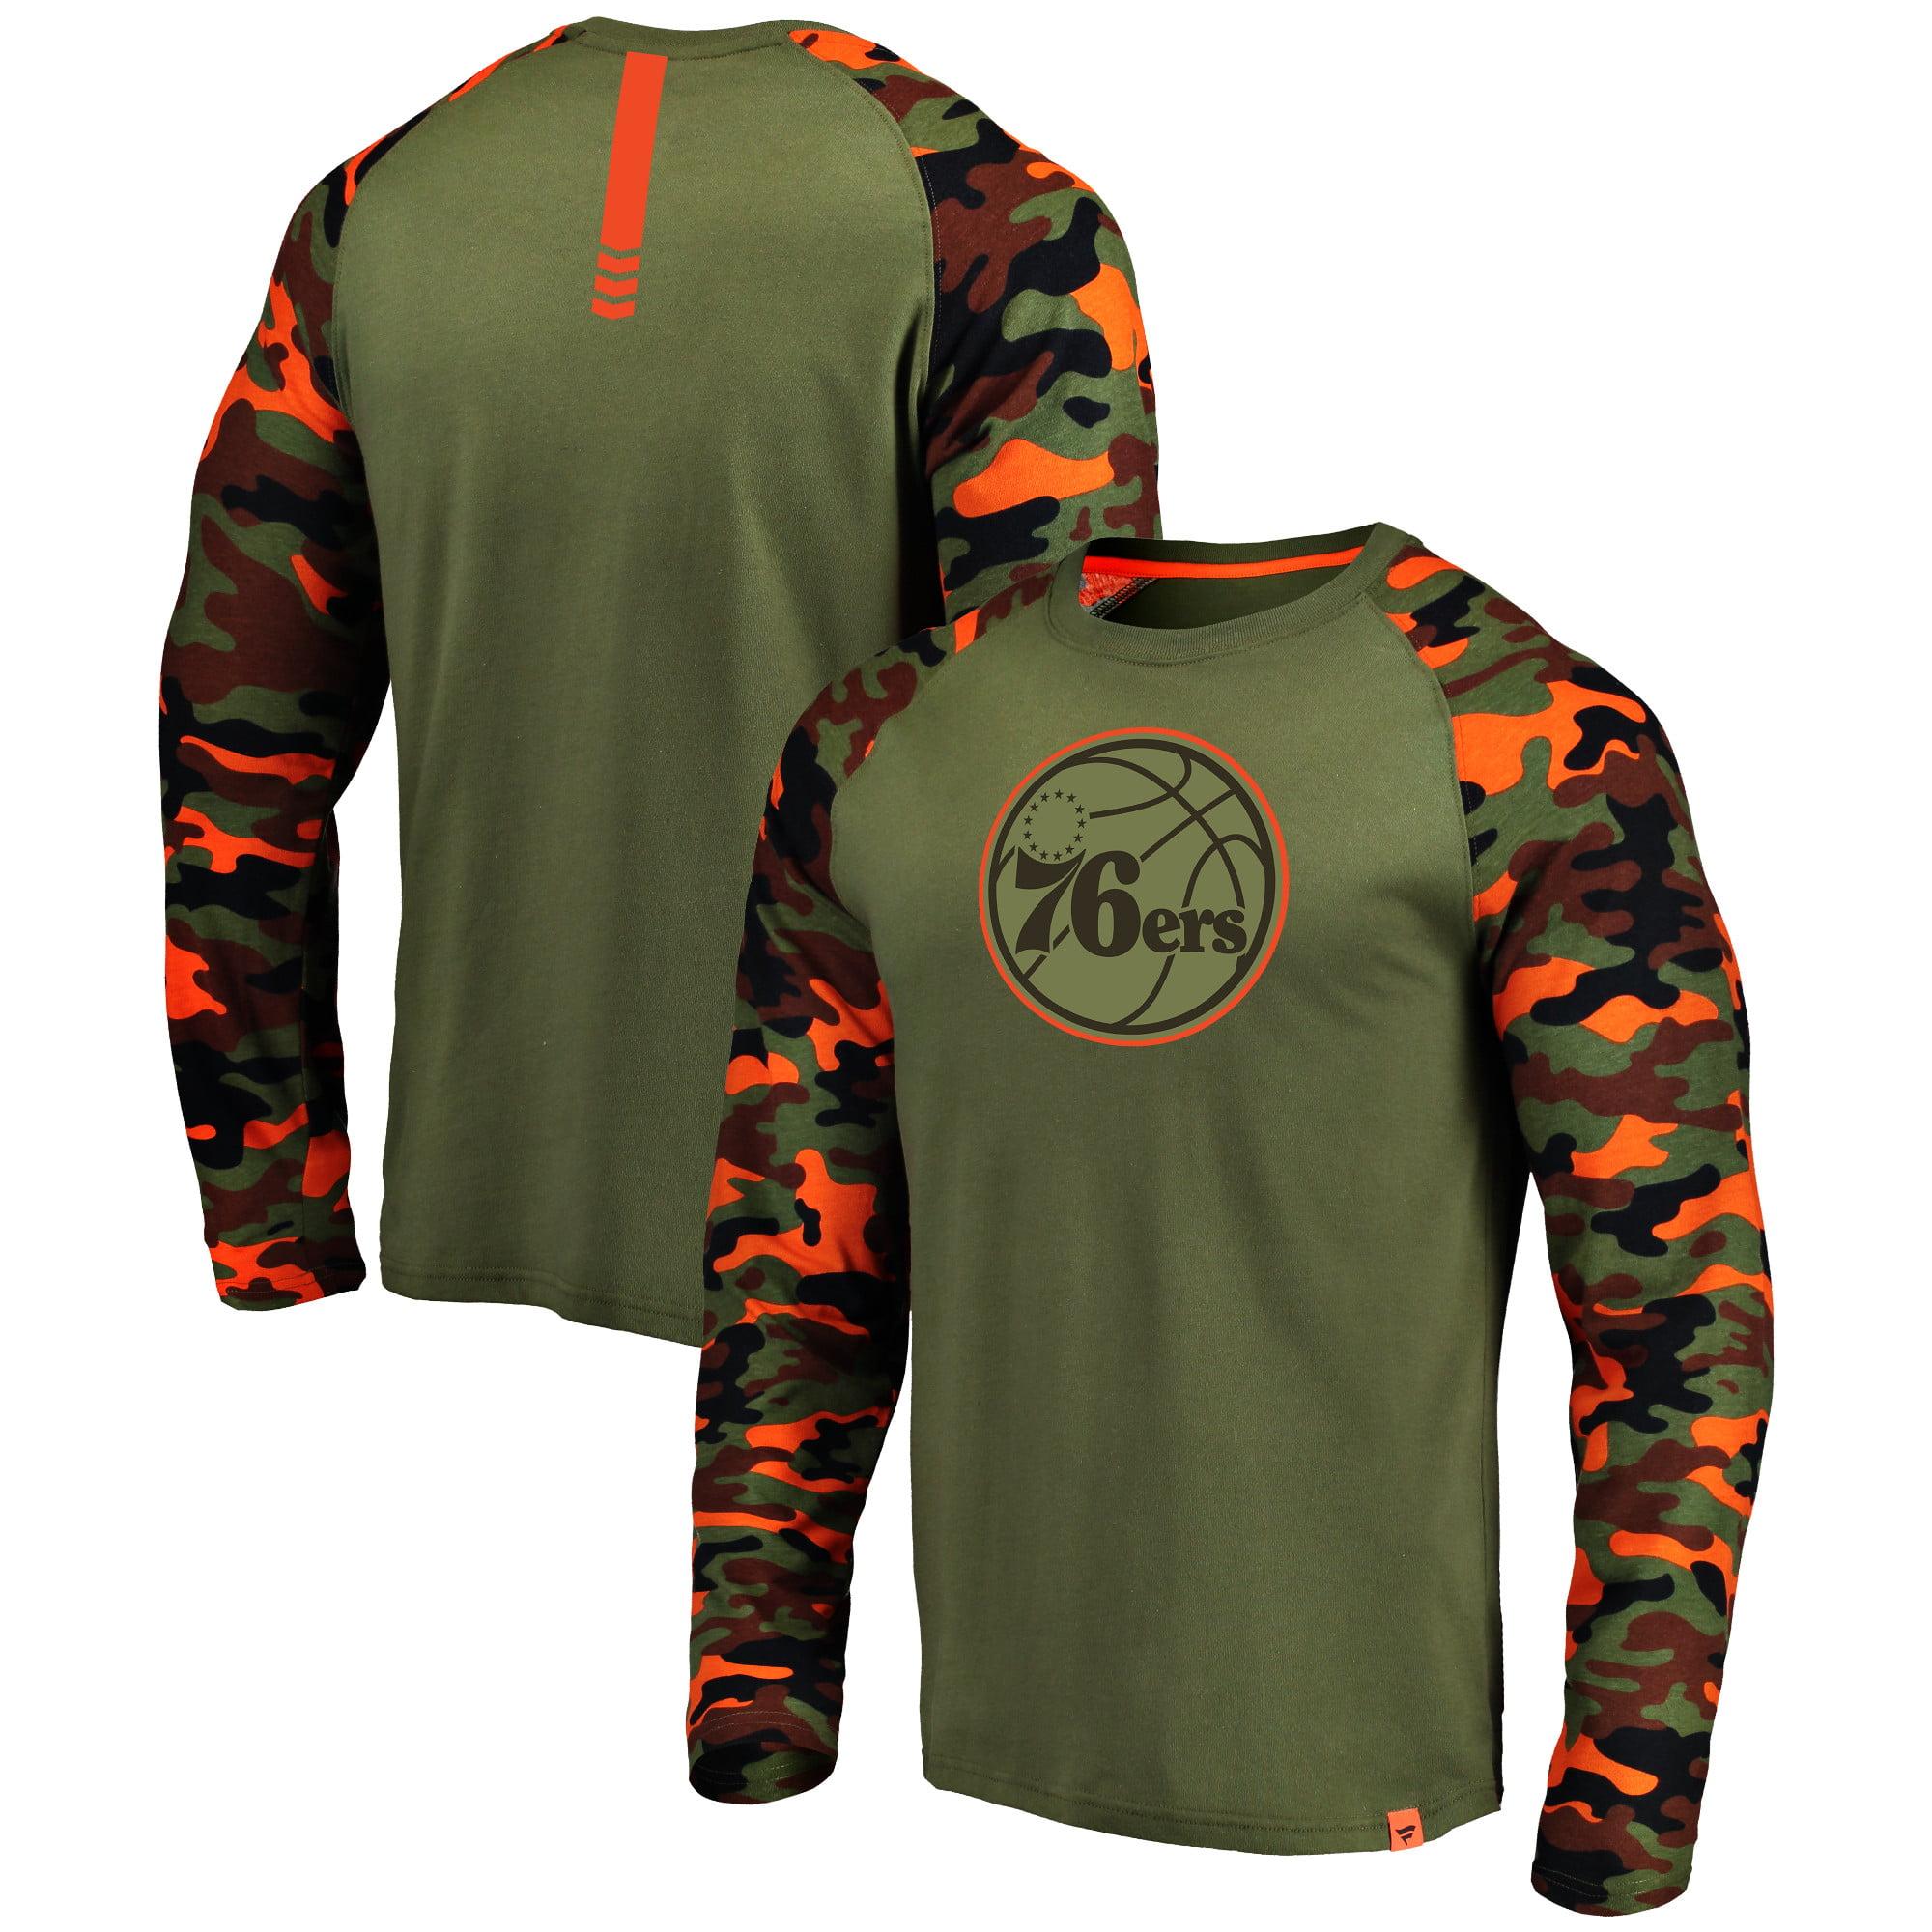 Philadelphia 76ers Fanatics Branded Recon Camo Raglan Long Sleeve T-Shirt - Olive/Camo